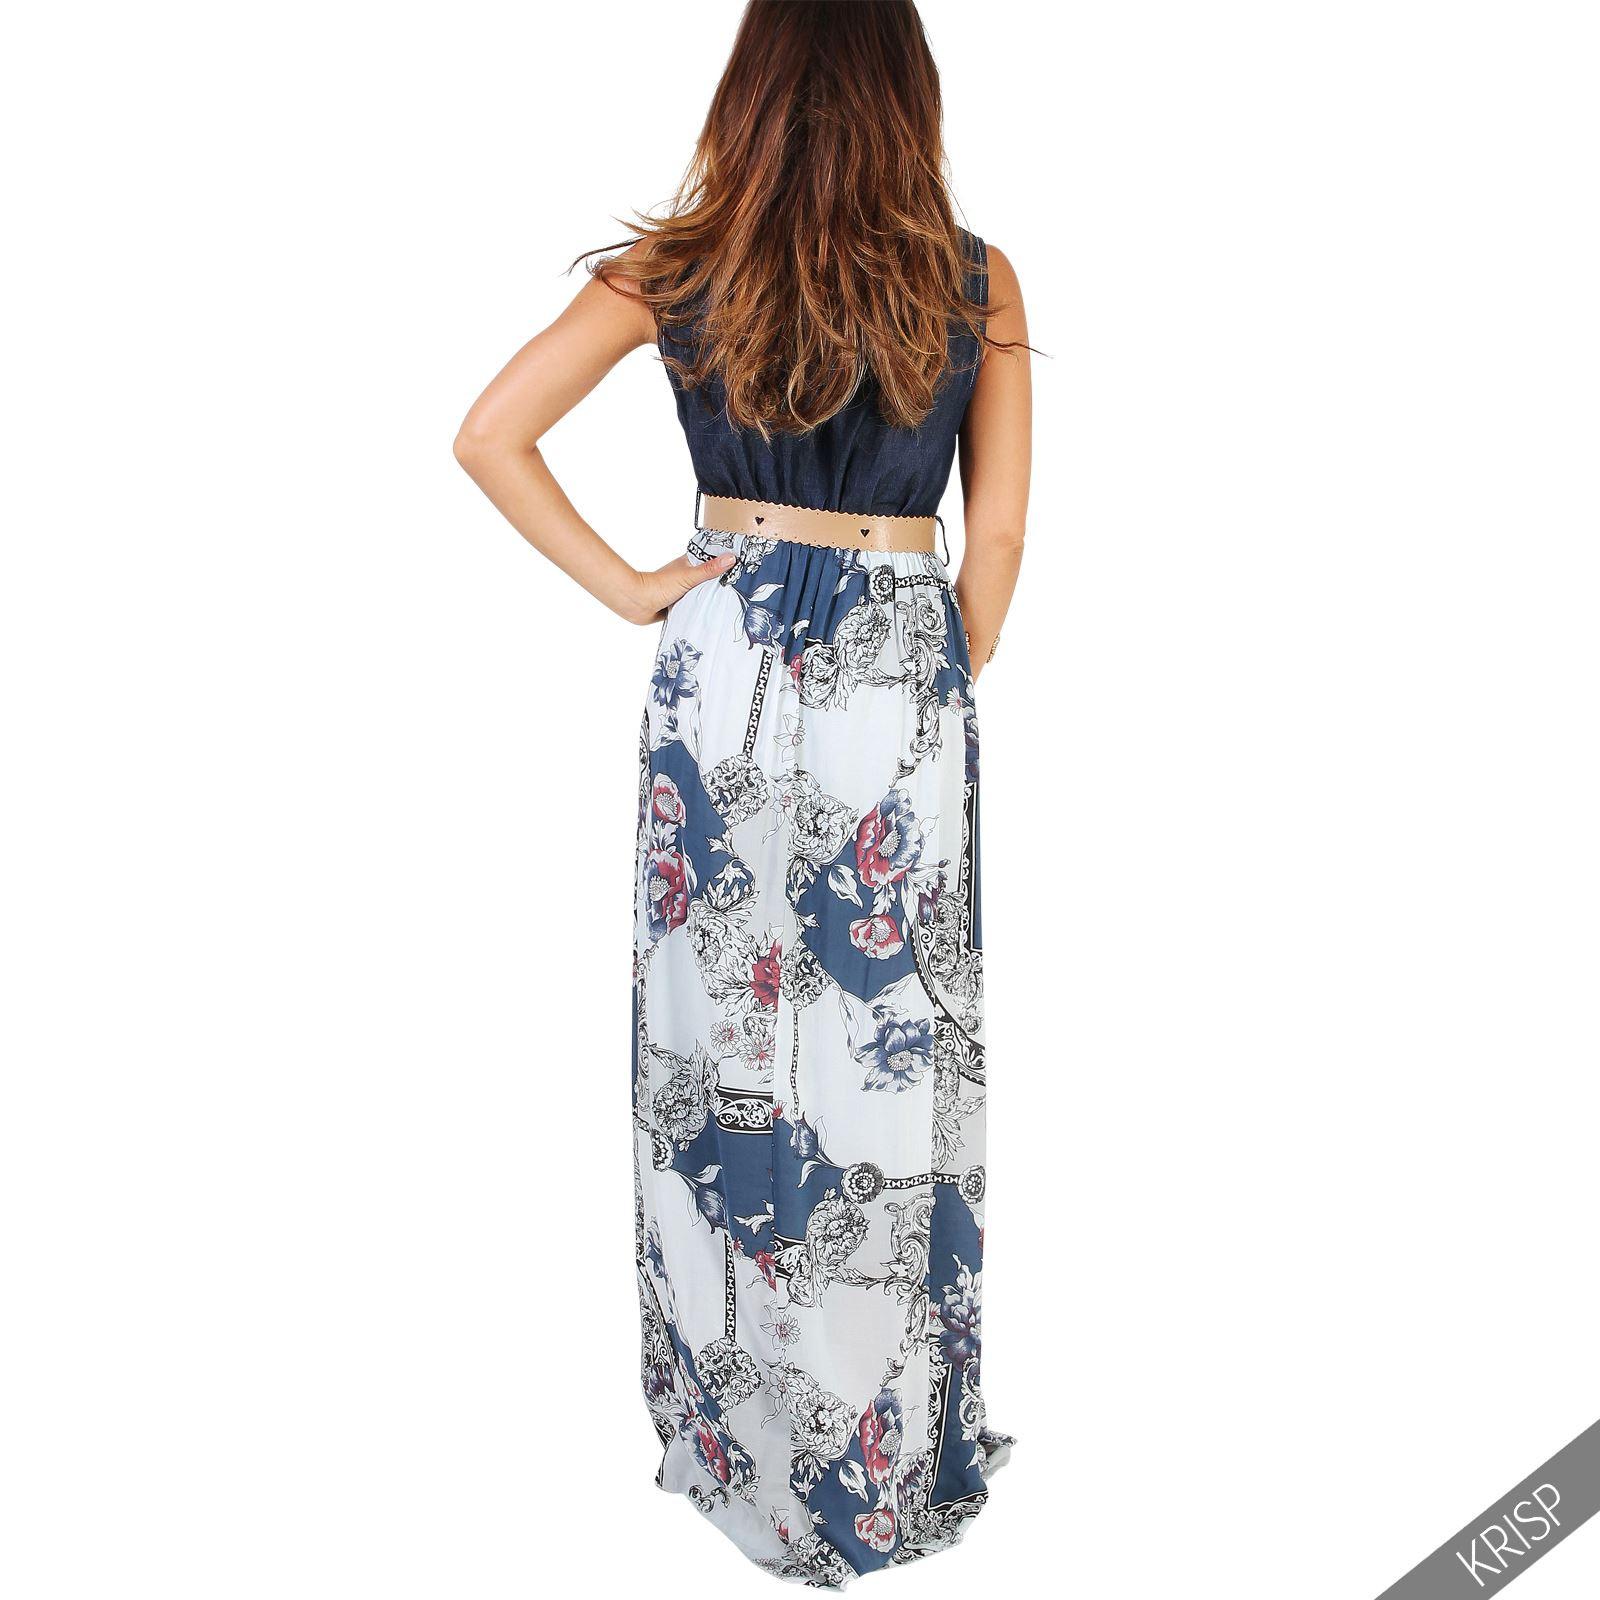 Damen Langes Sommerkleid Inklusive Gürtel Denim Floral